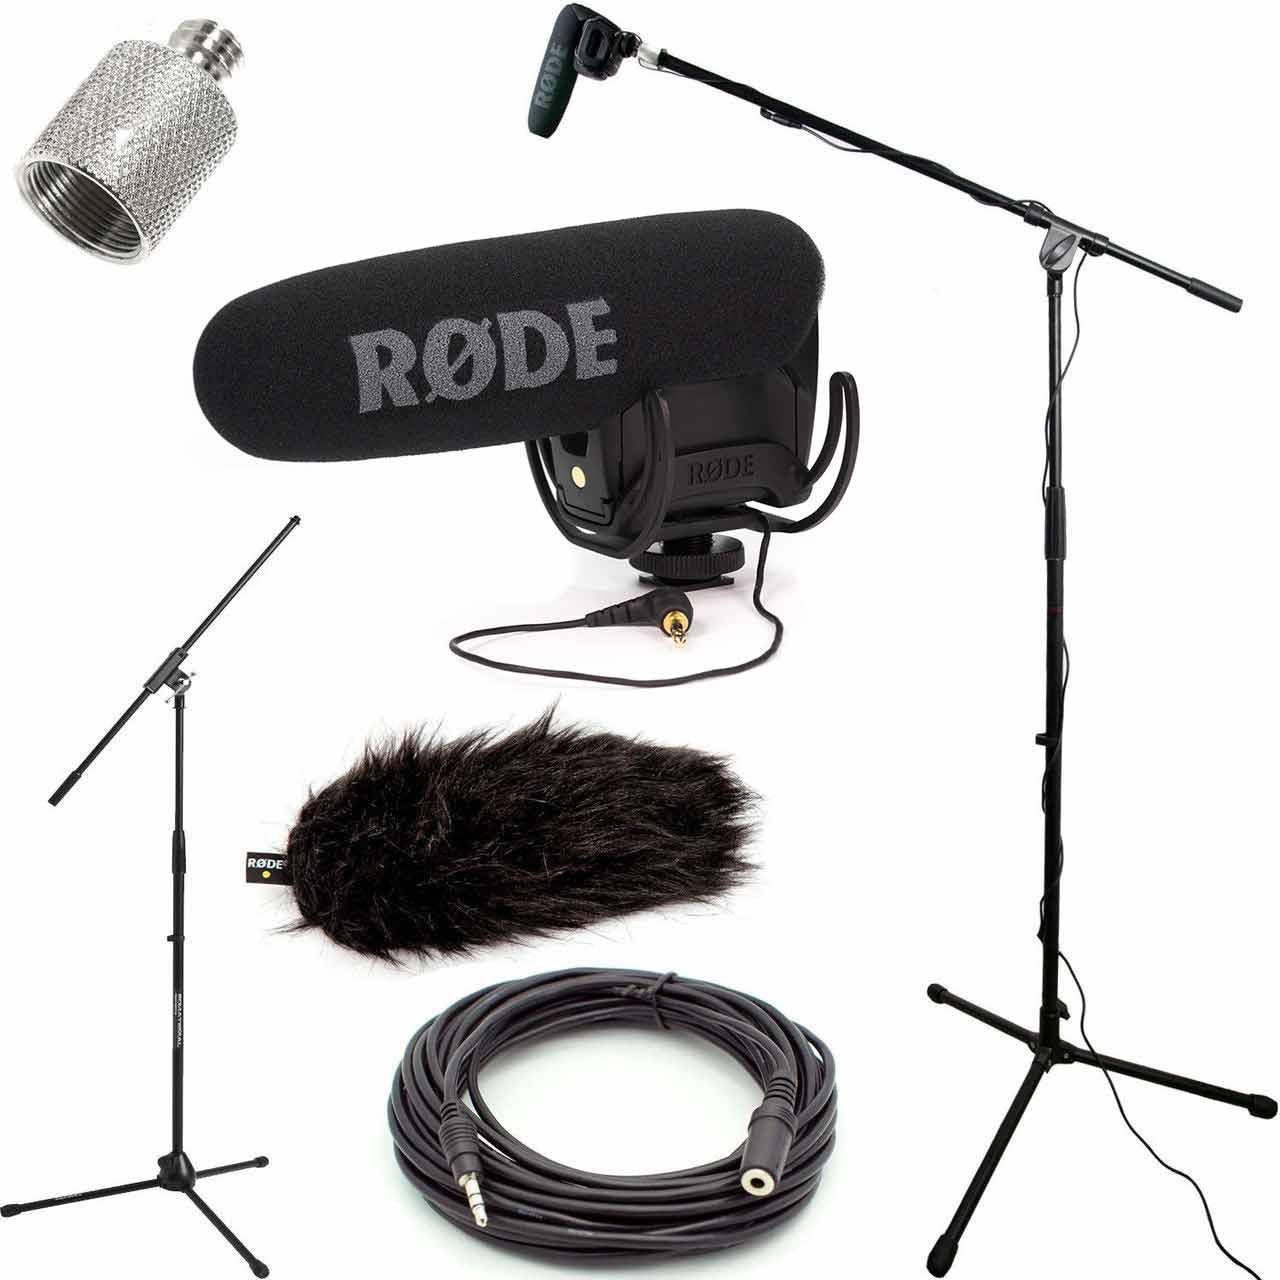 Rode Videomic Pro Microphone Studio Boom Kit With Deadcat